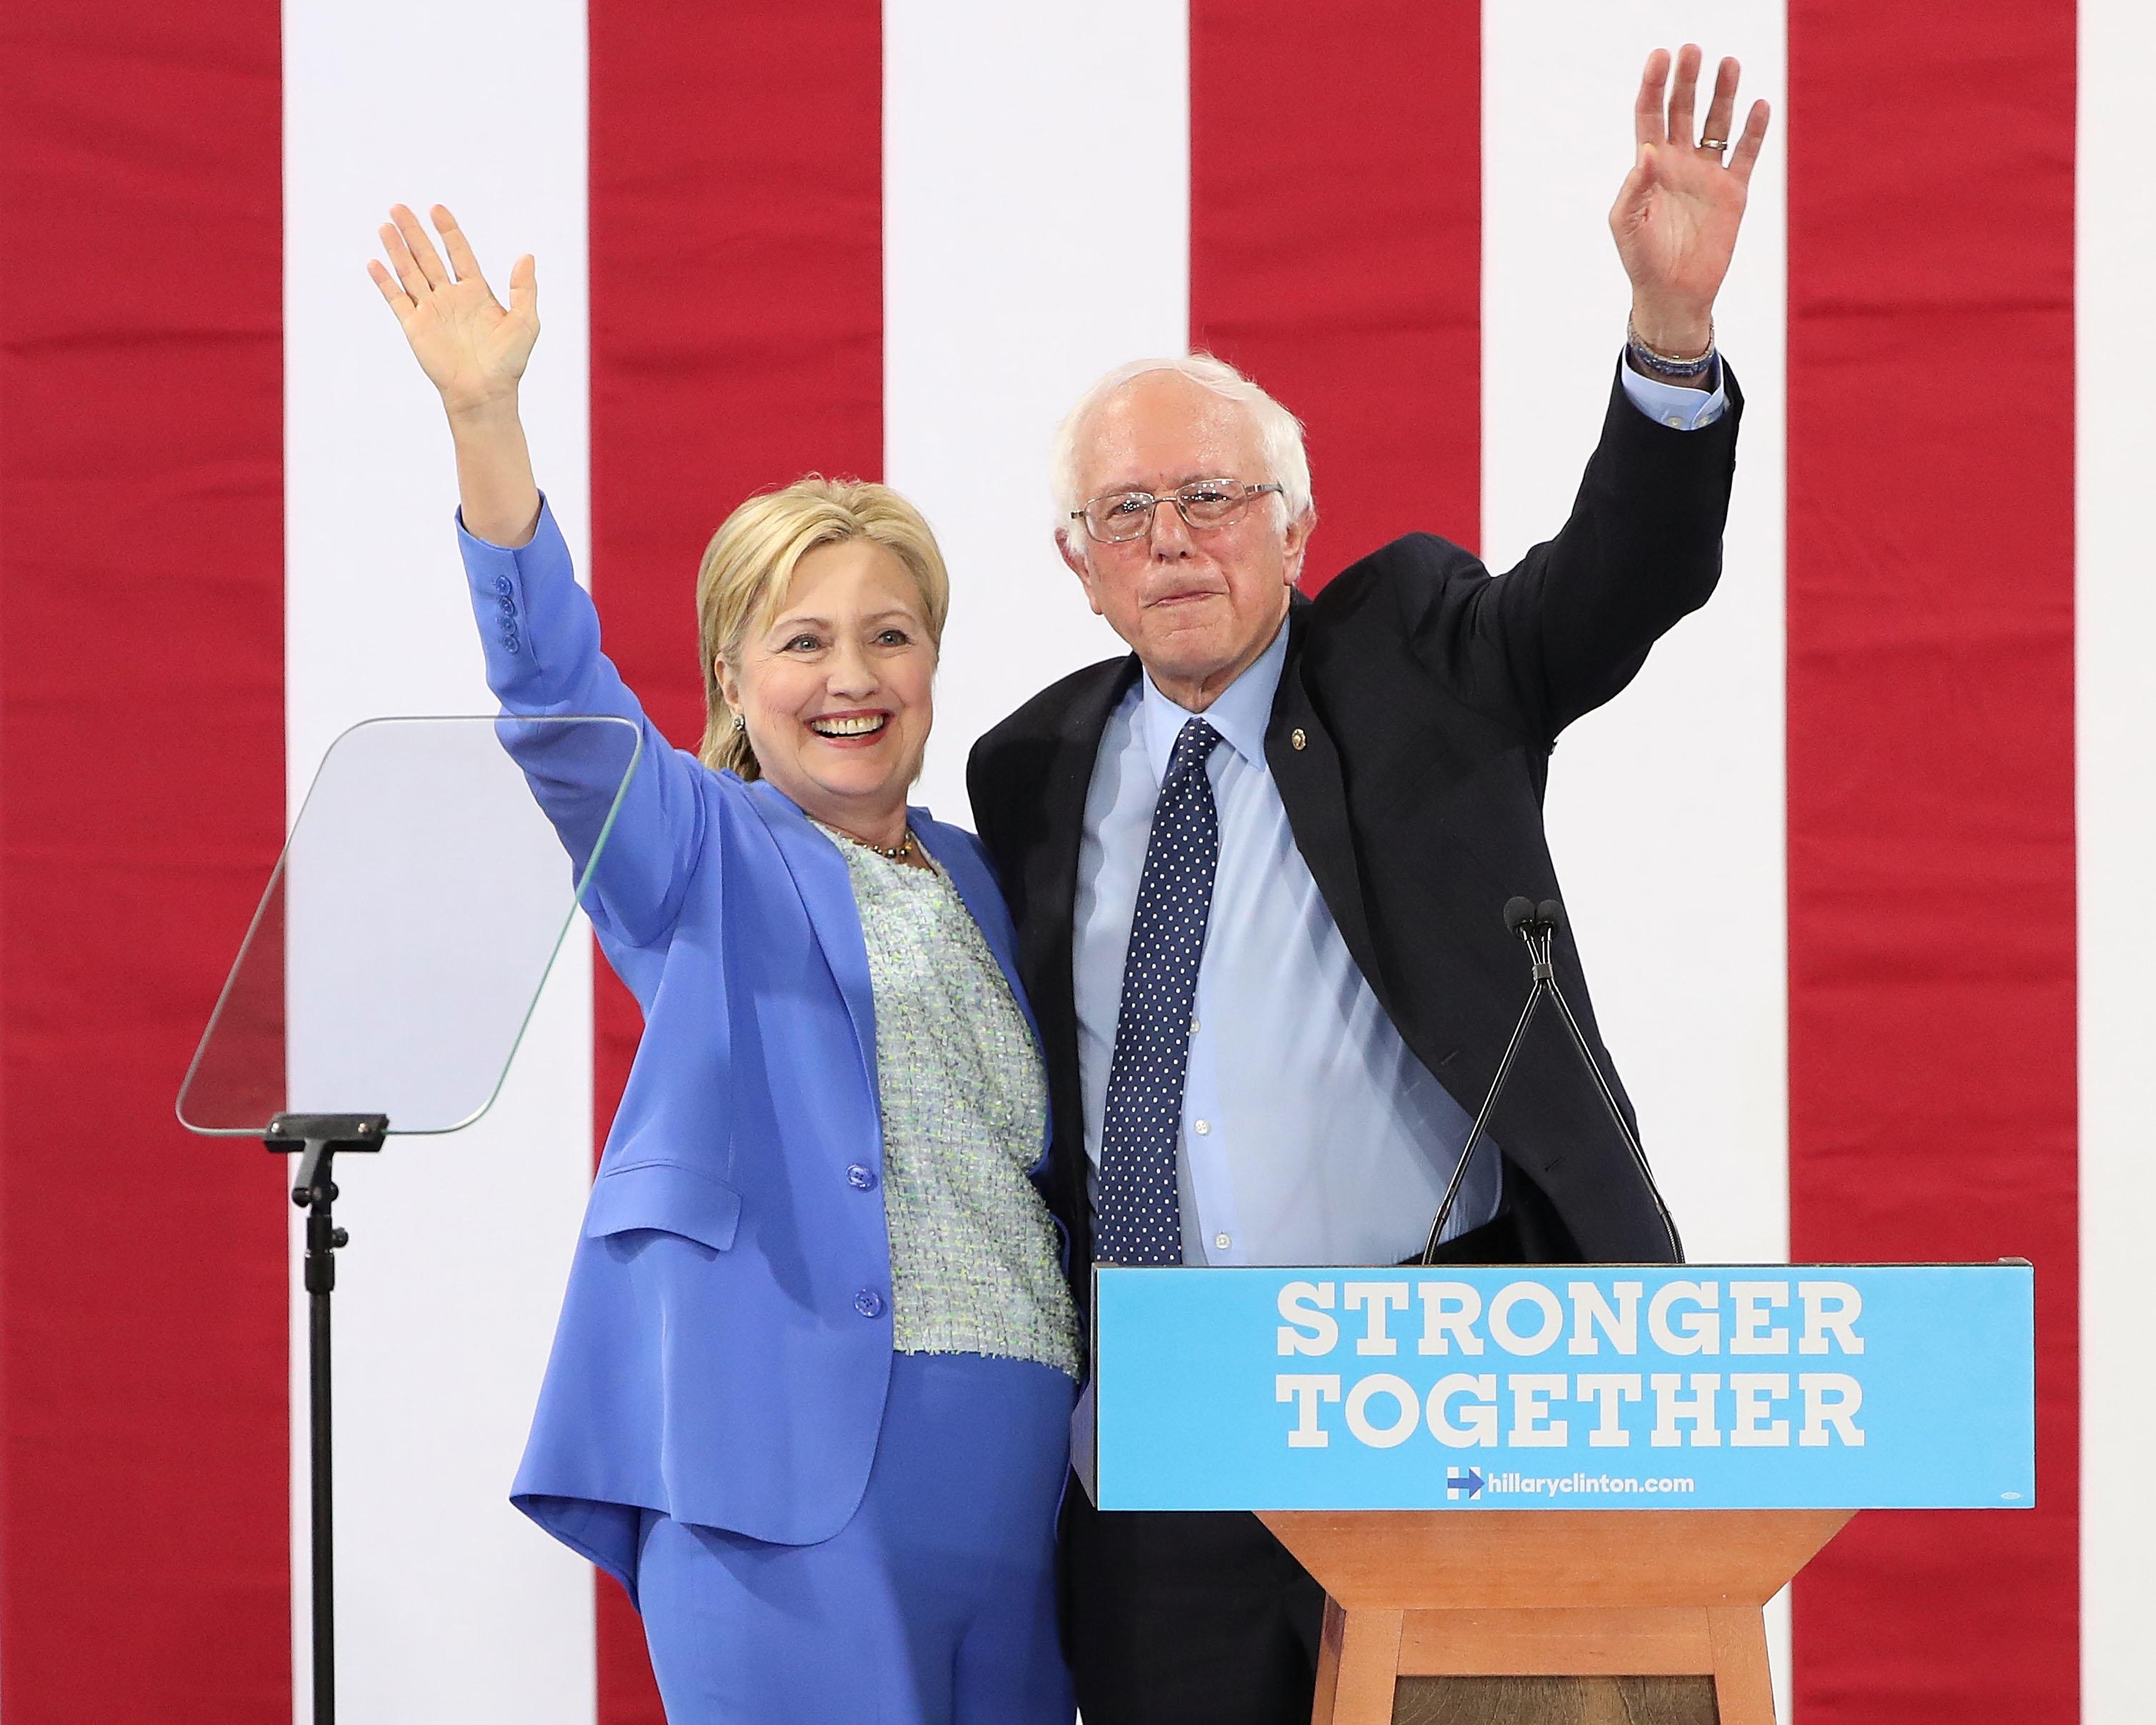 Progressives wonder whether Hillary Clinton's embrace of independent Vermont Sen. Bernie Sanders' more populist policies will